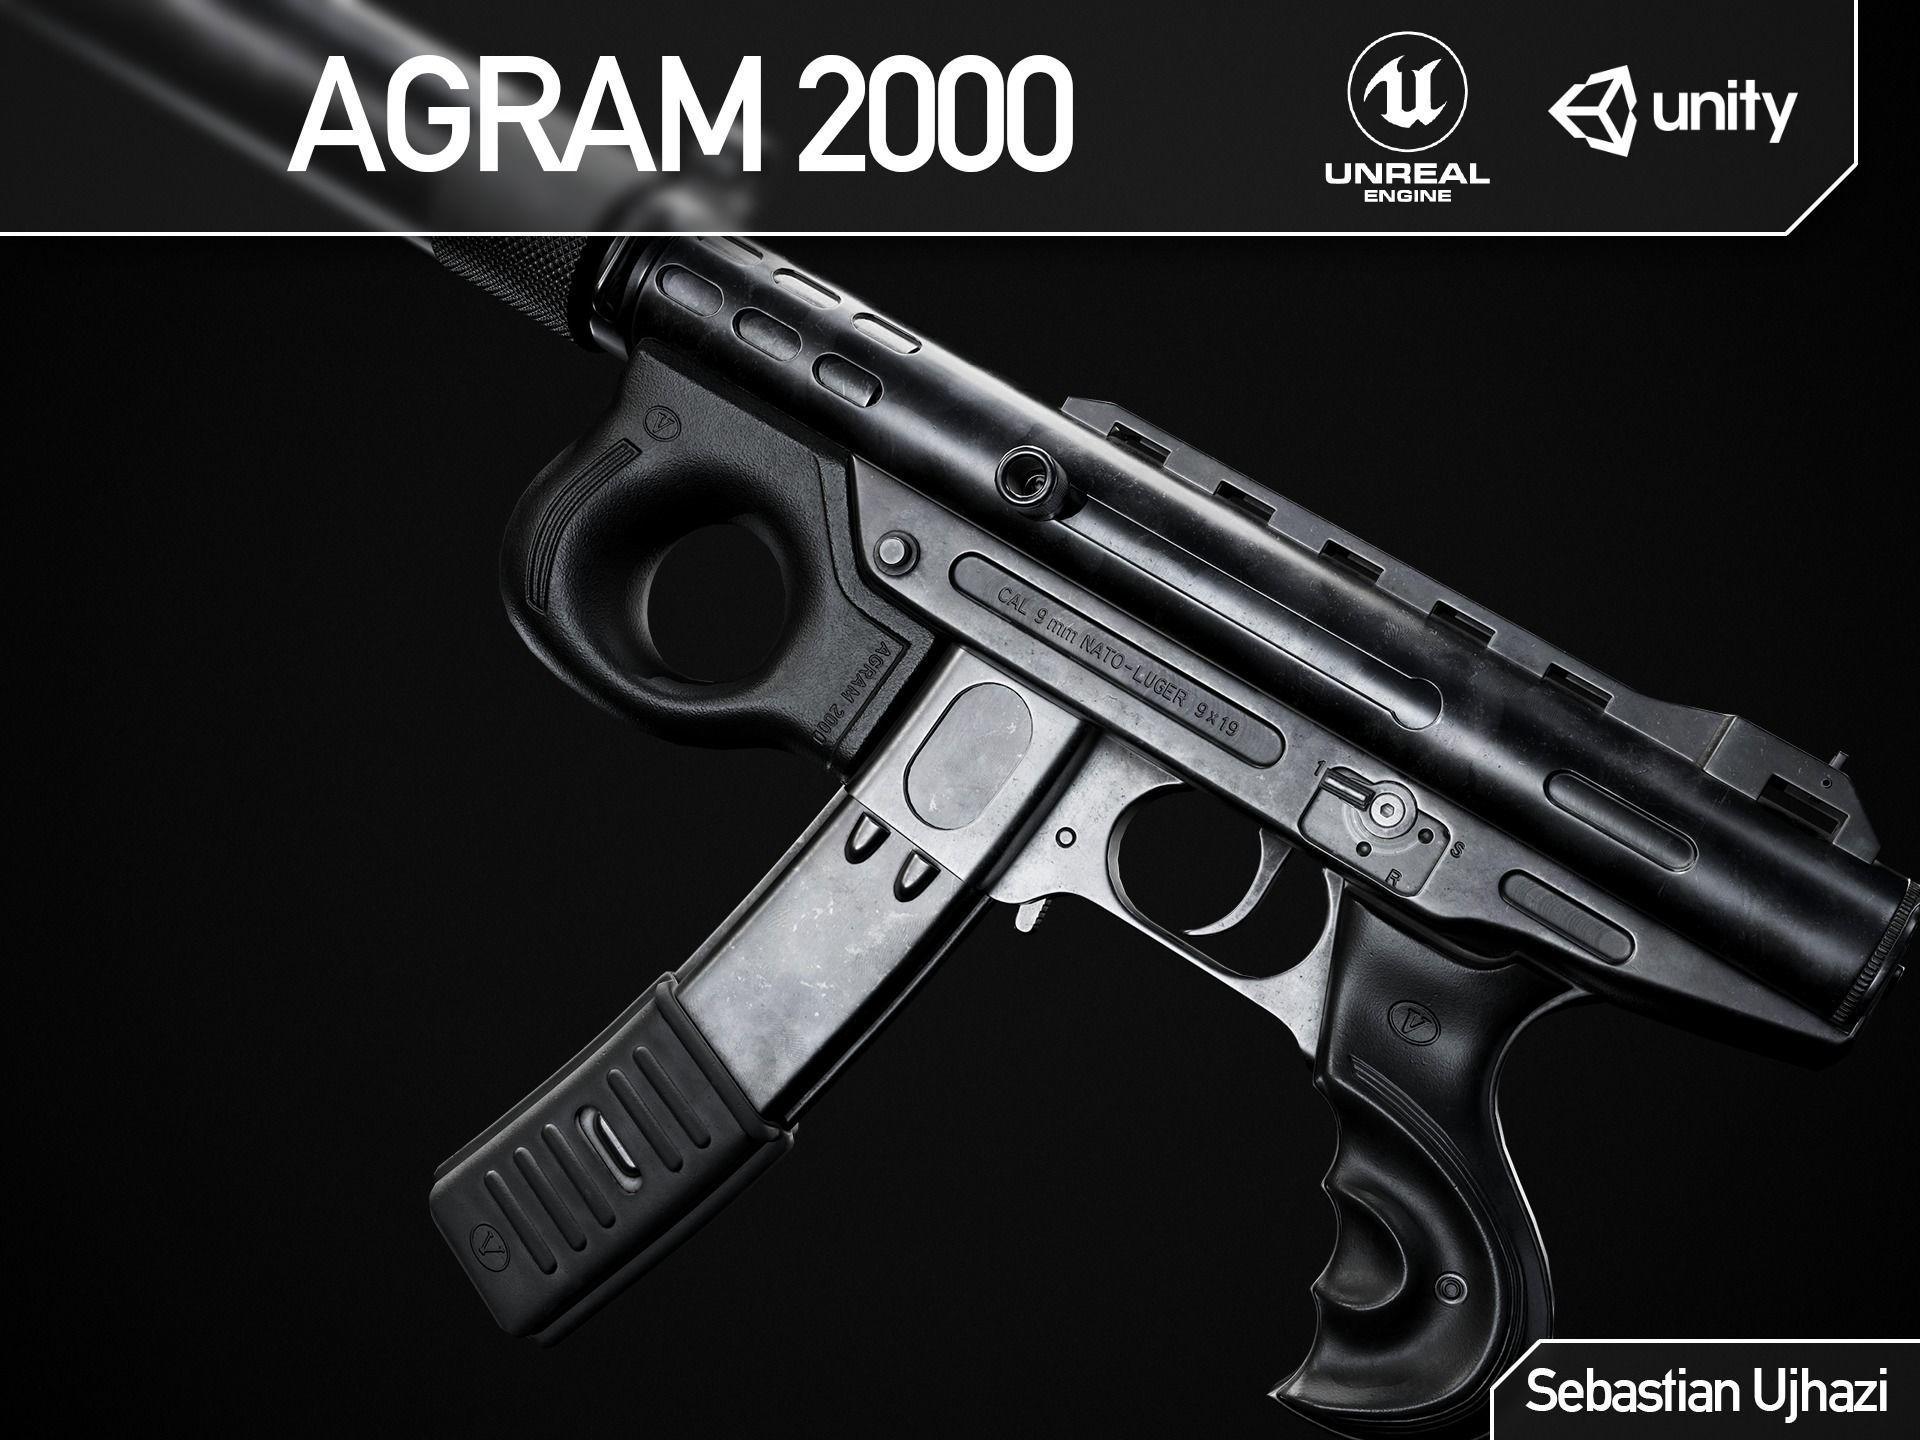 Agram 2000 - Game Ready PBR Asset